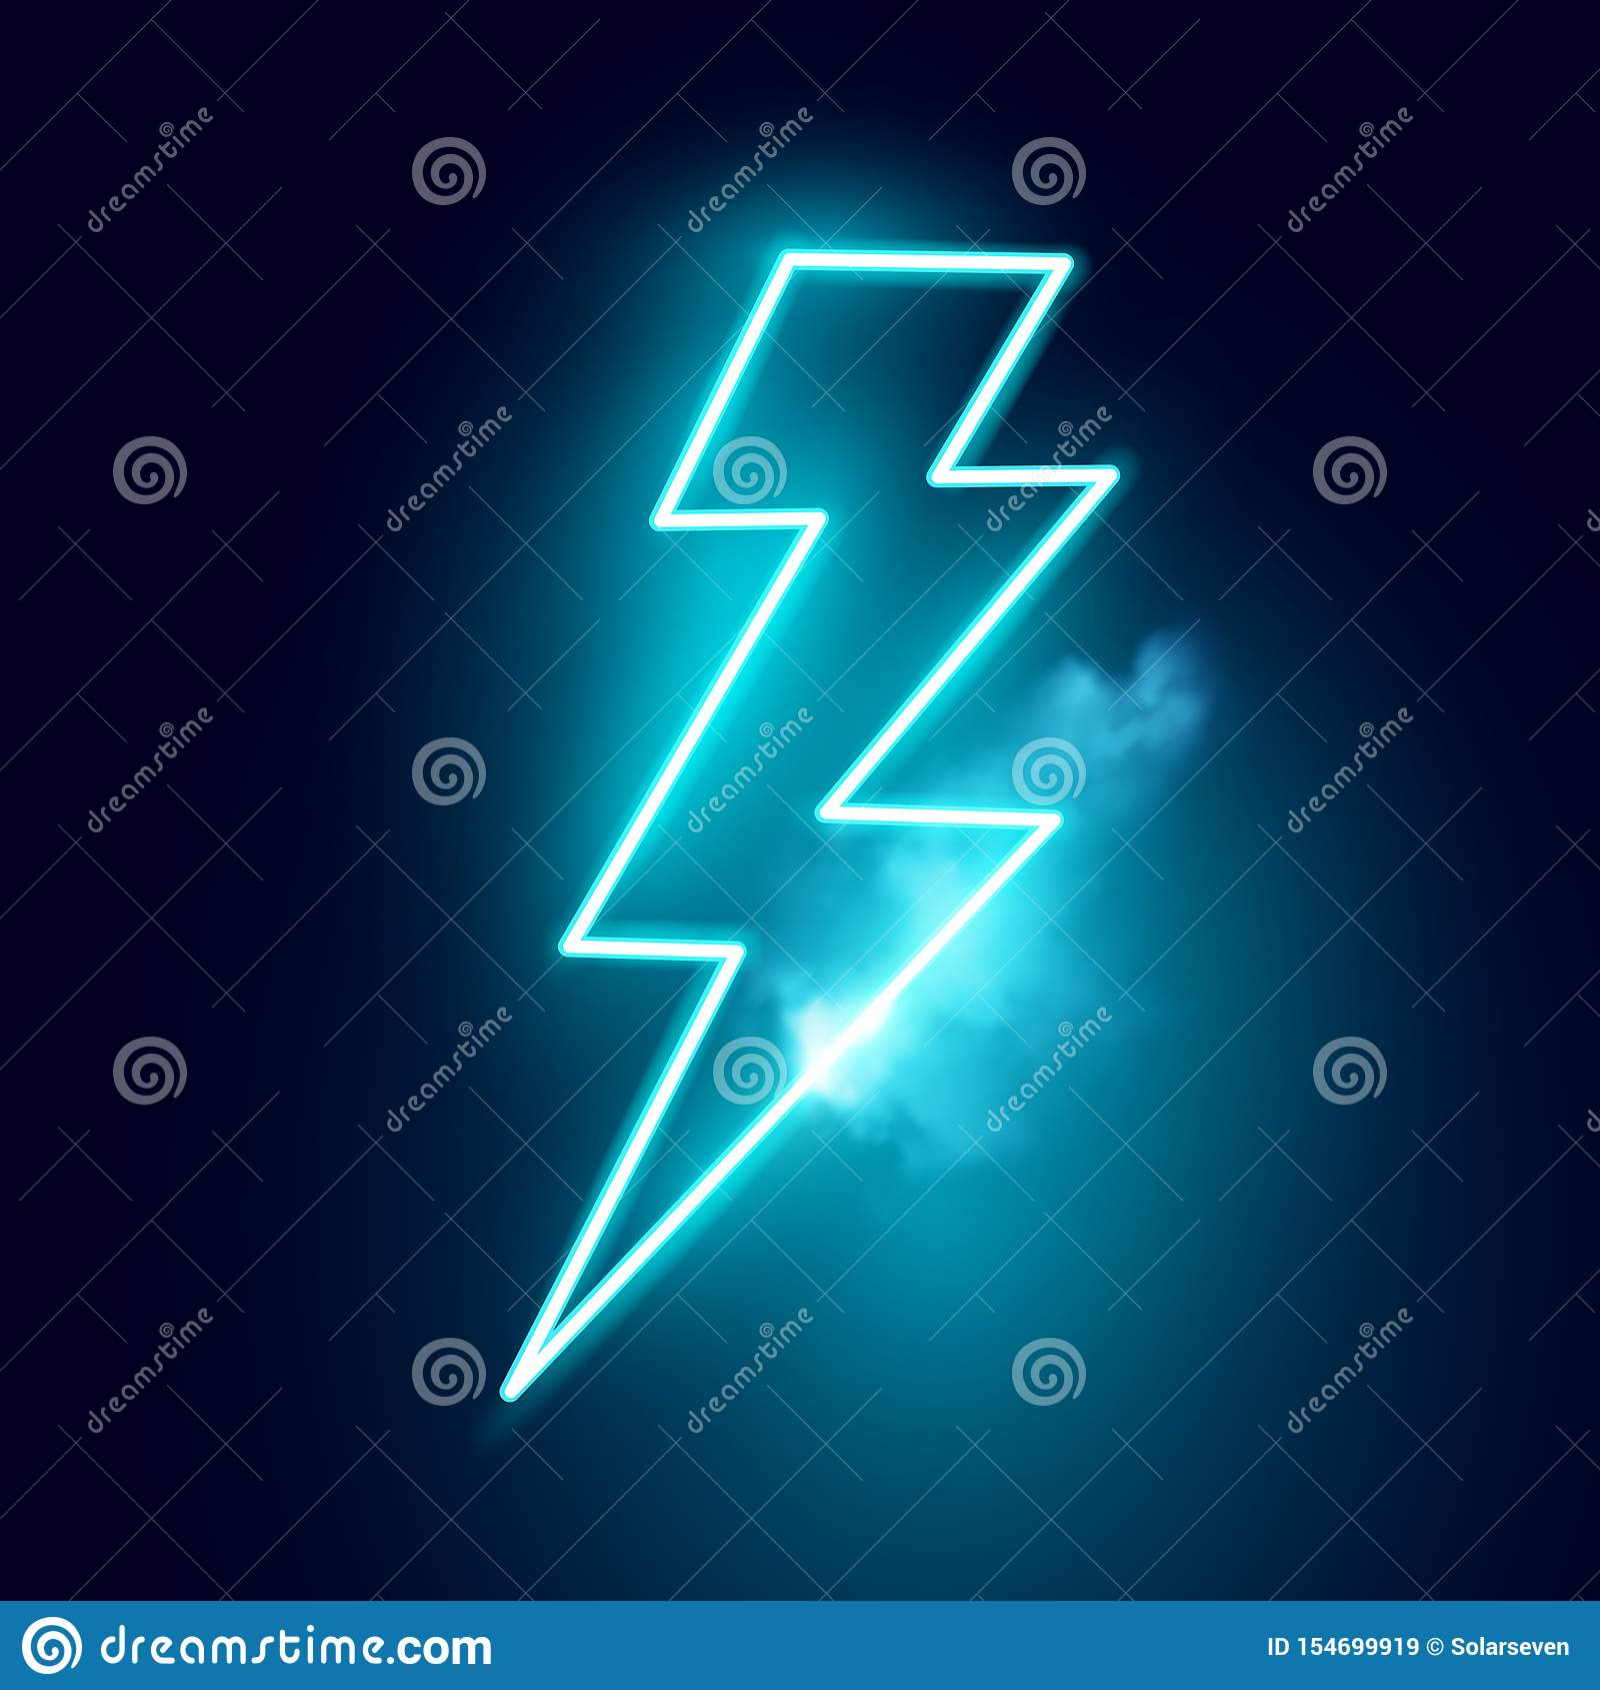 Neon Electric Lightning Bolt Vector Stock Vector   Illustration of ...